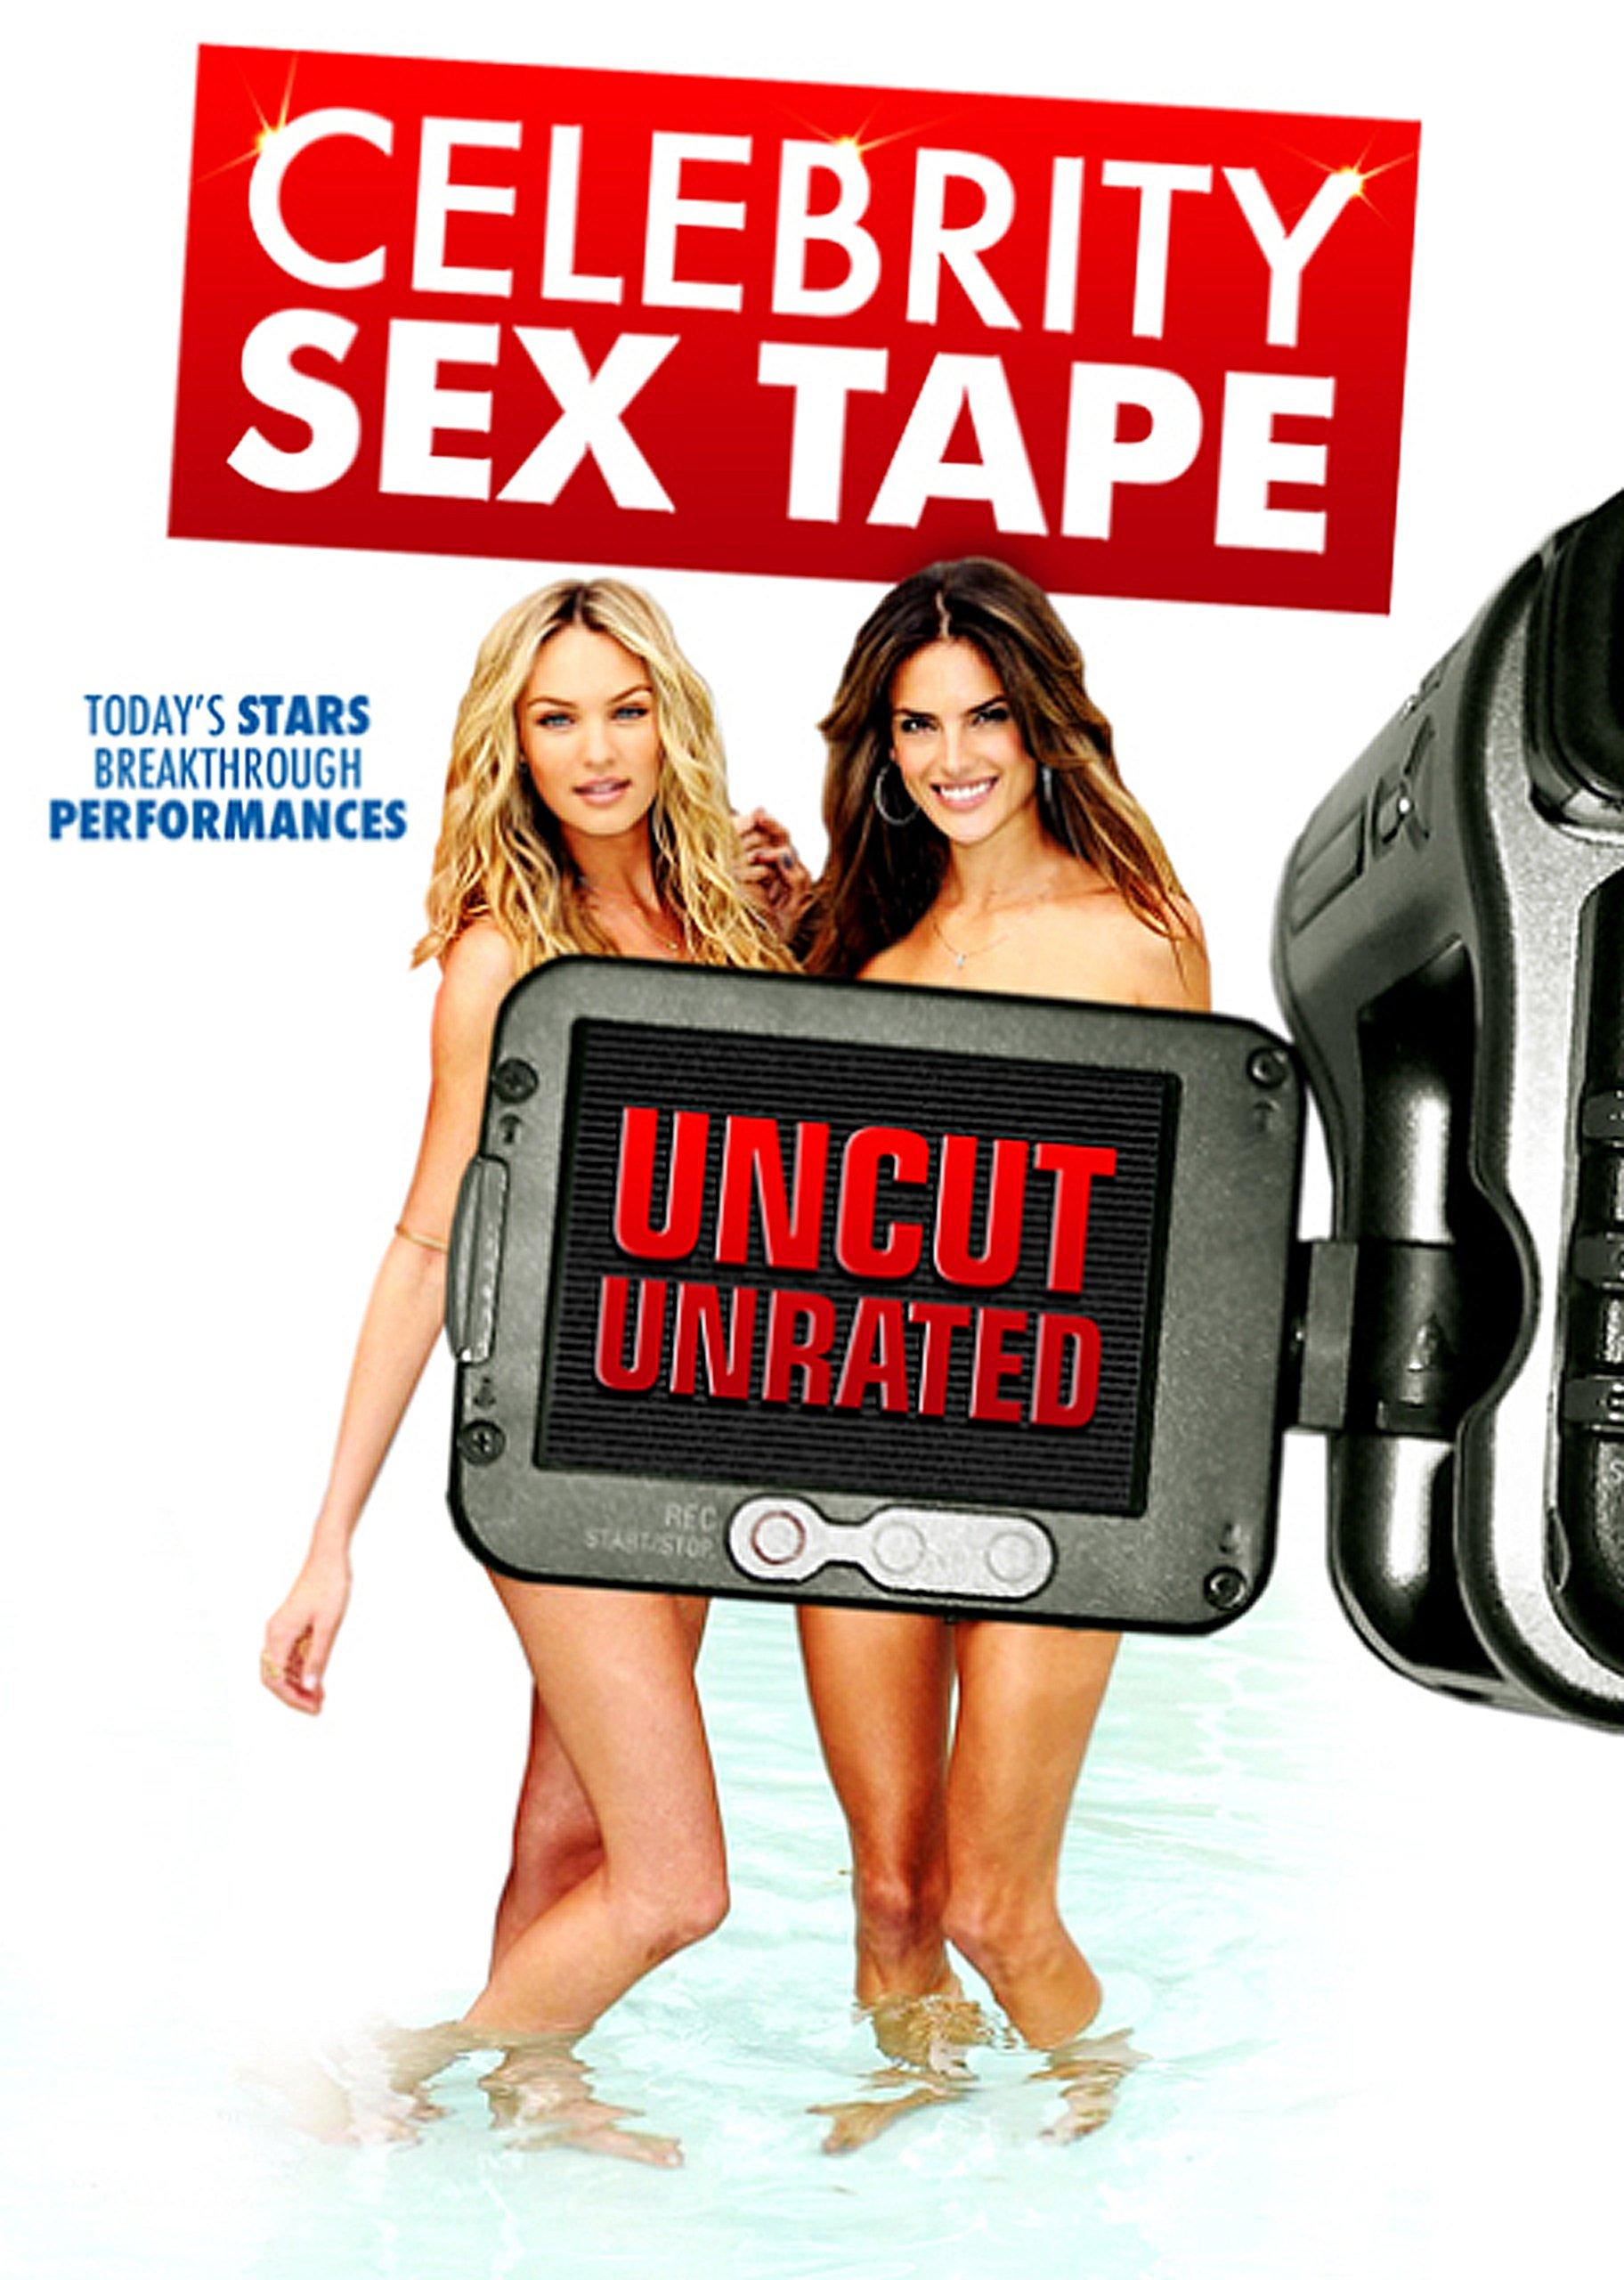 Sex tape stars Female Celebrities